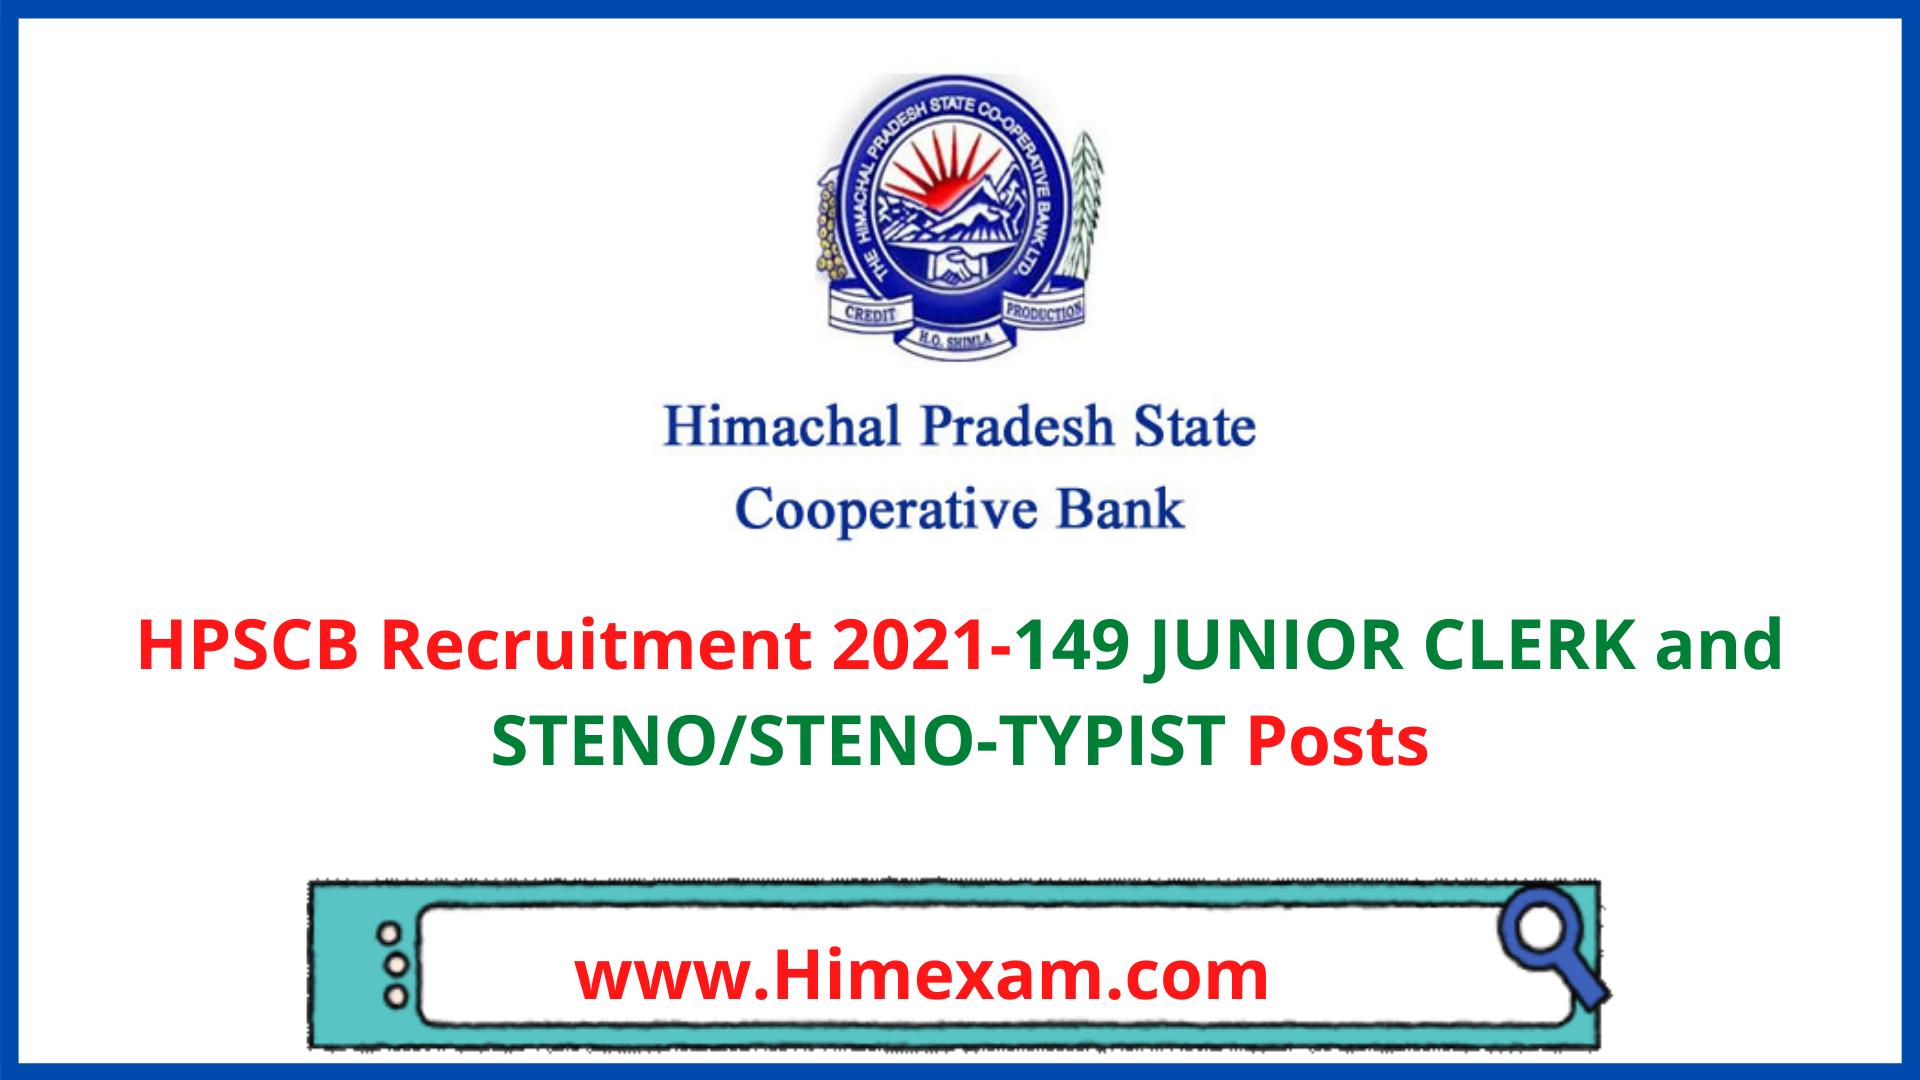 HPSCB Recruitment 2021-149 JUNIOR CLERK and STENO/STENO-TYPIST Posts